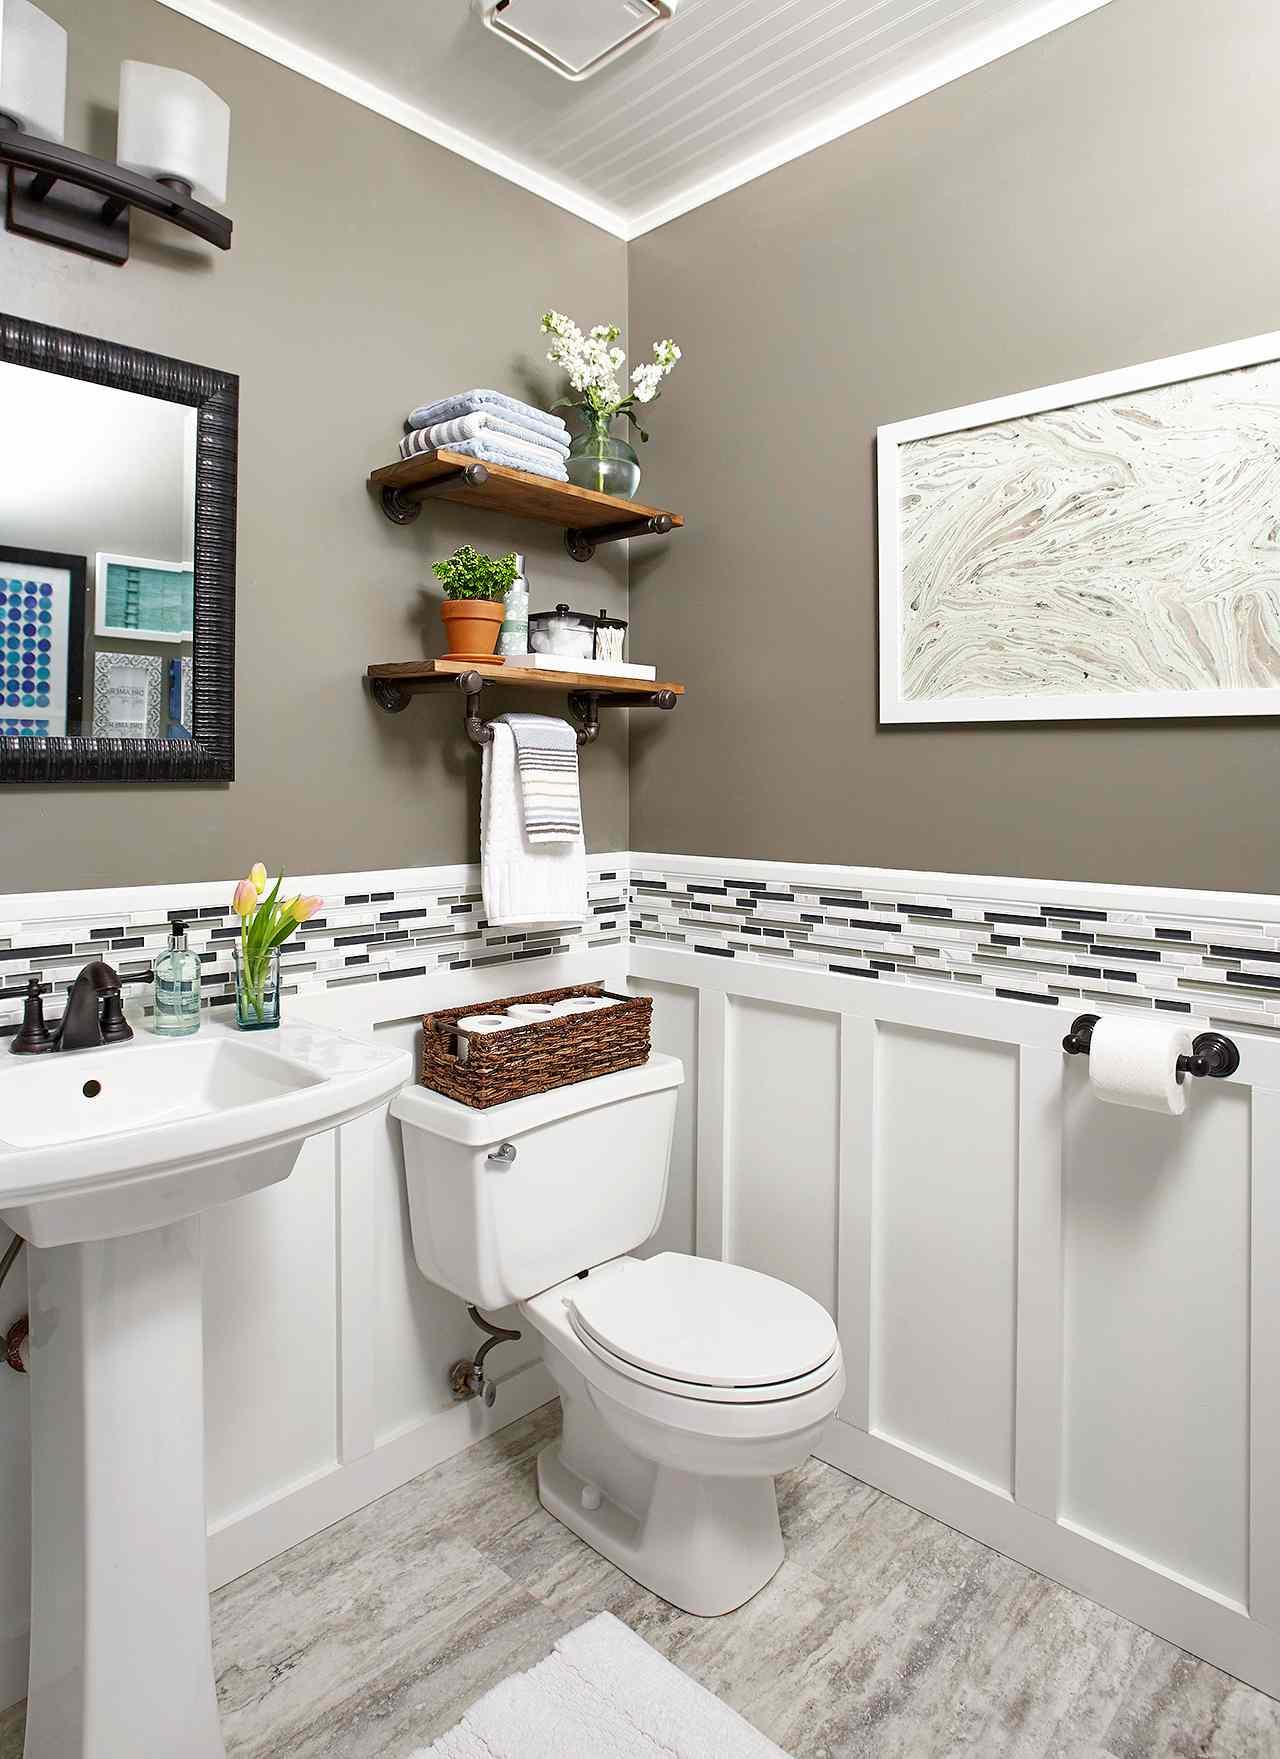 Powder Room Ideas | Better Homes & Gardens on Bathroom Ideas Apartment  id=96614